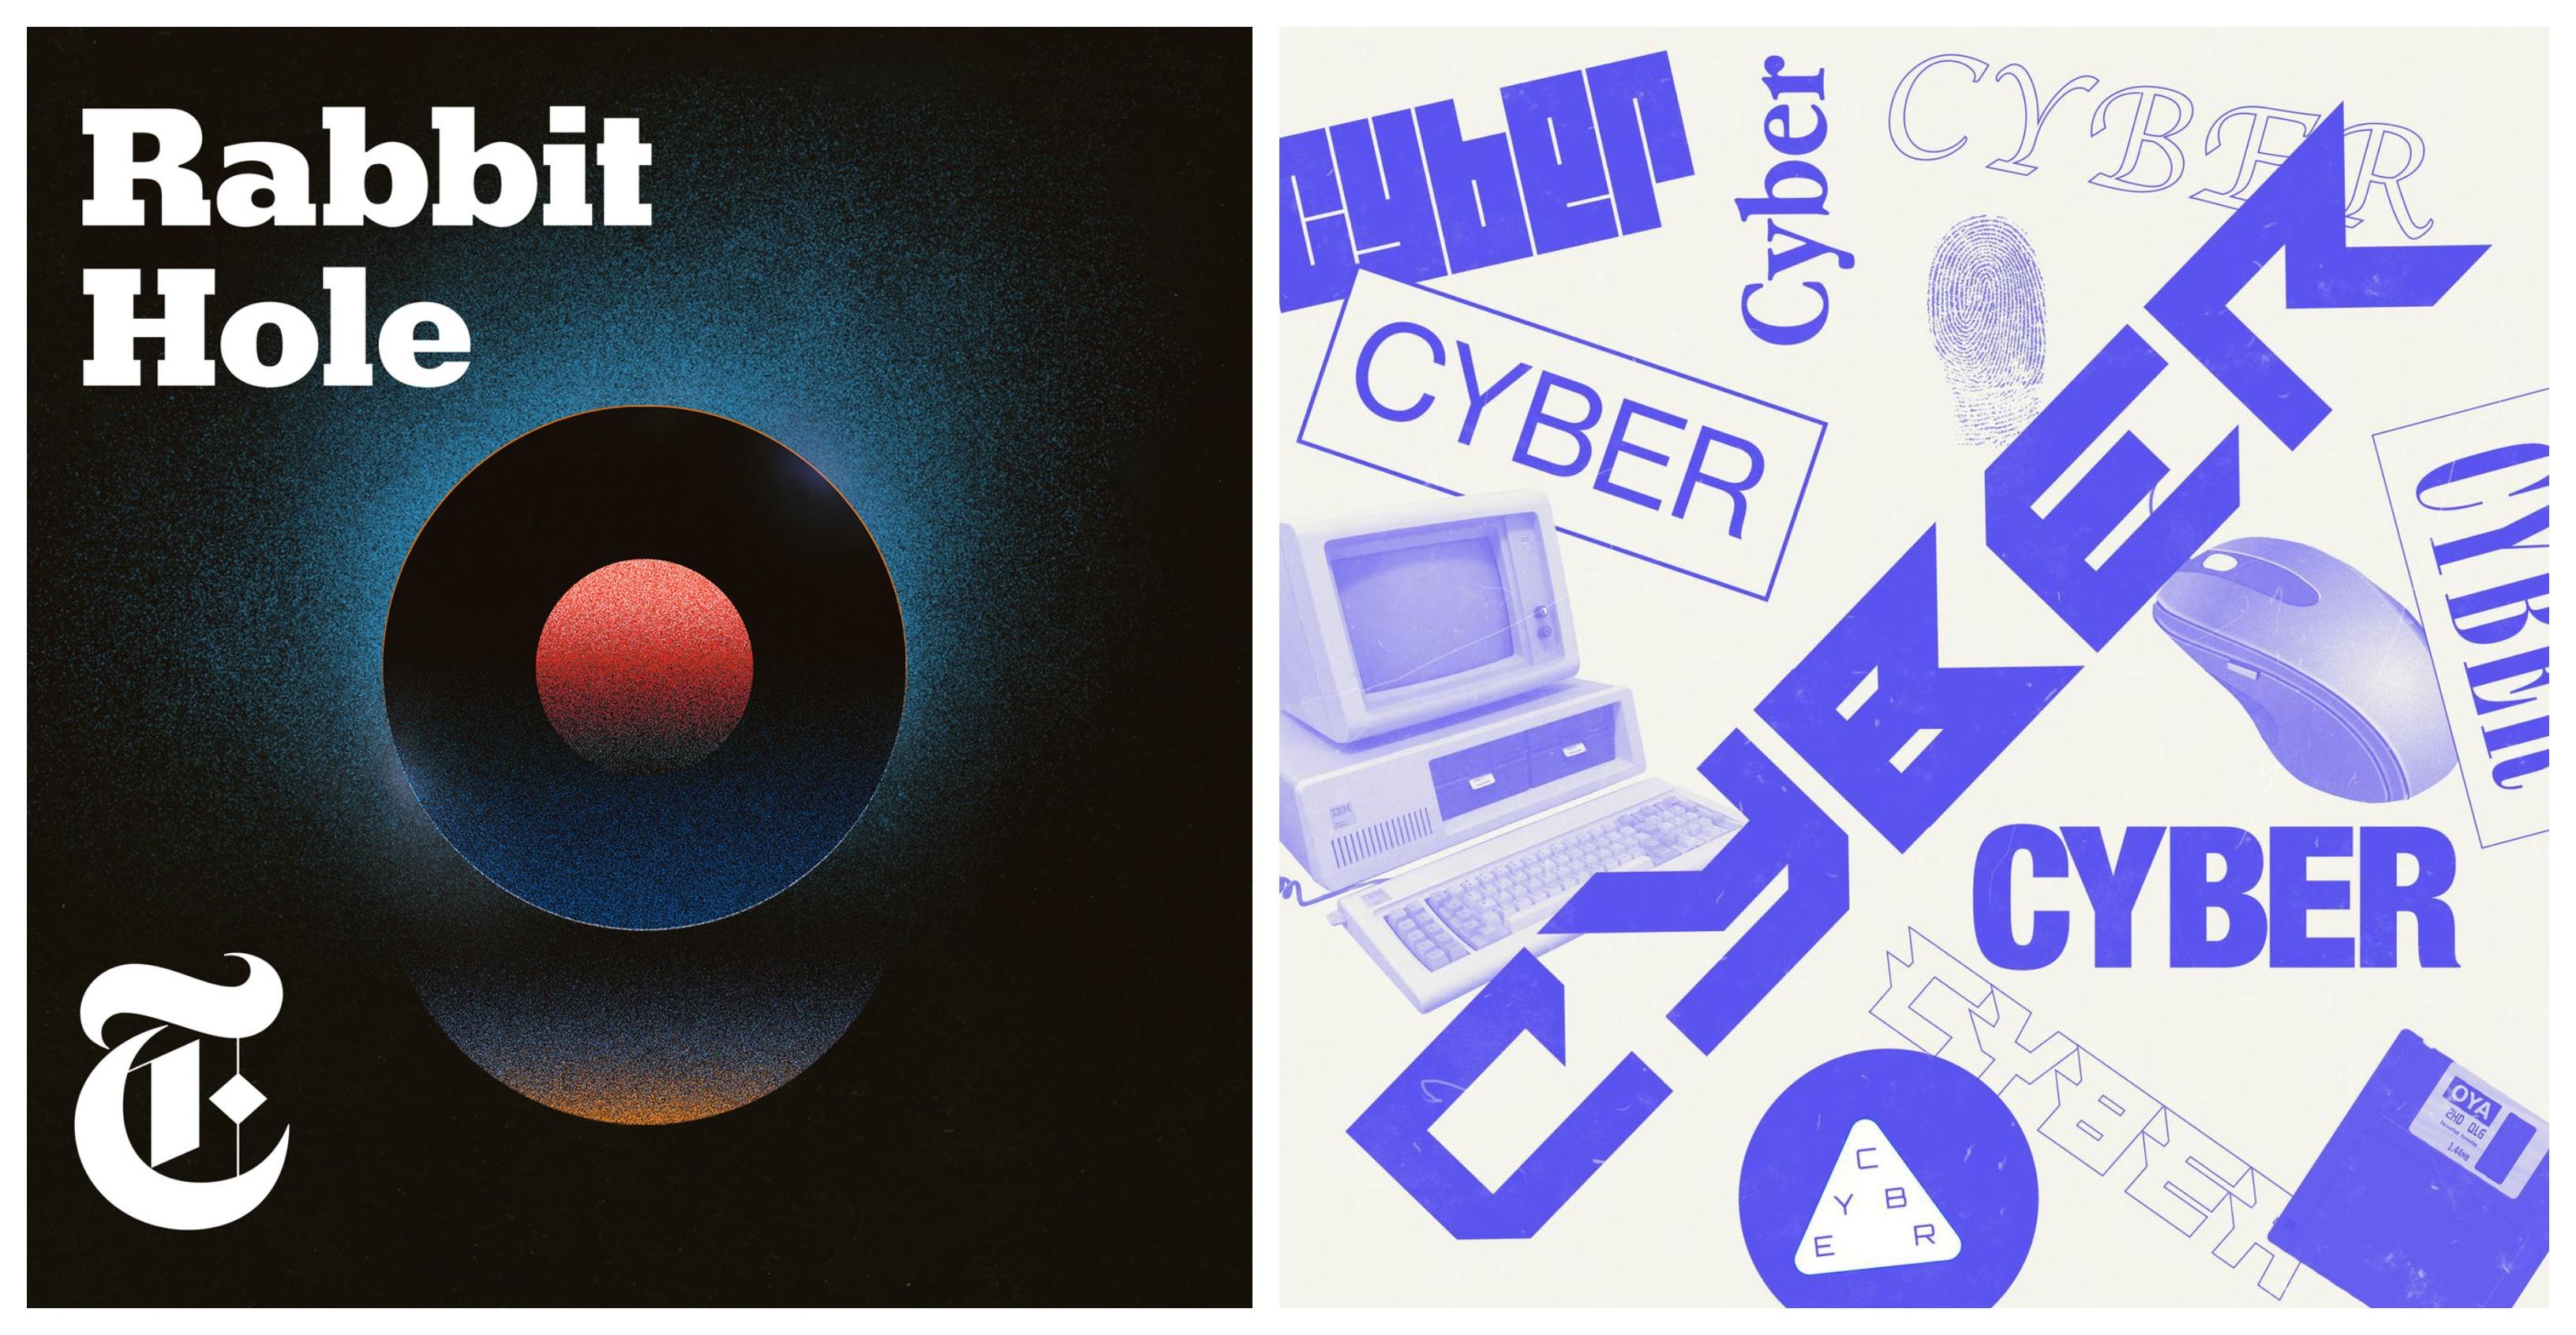 Rabbit Hole - Cyber